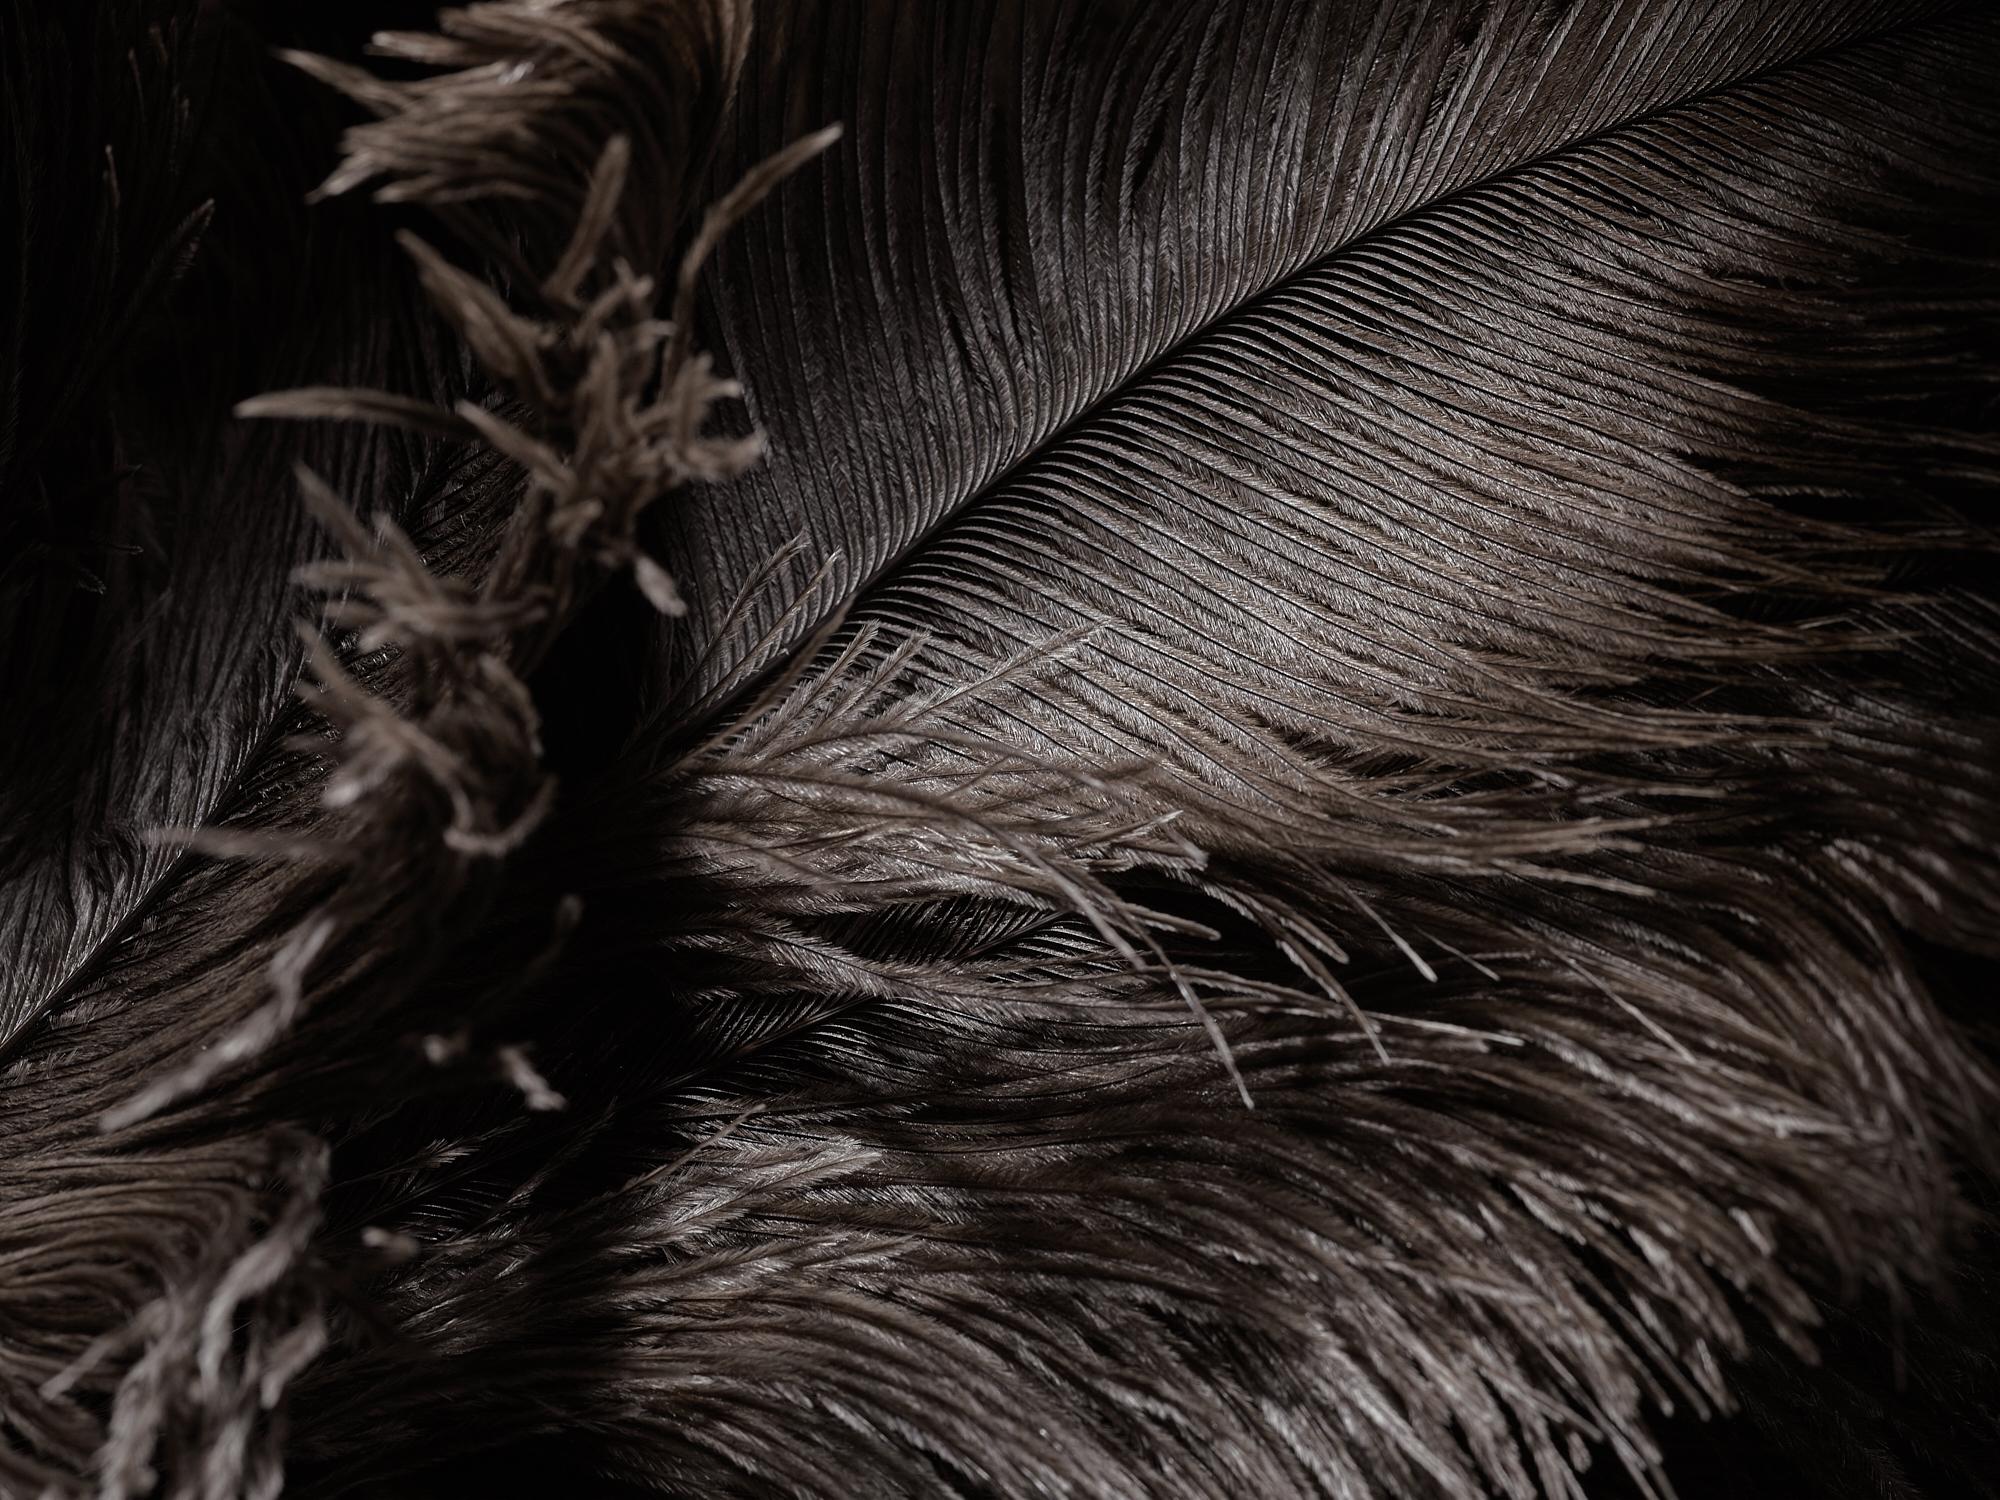 Feathers_171118_0089.jpg